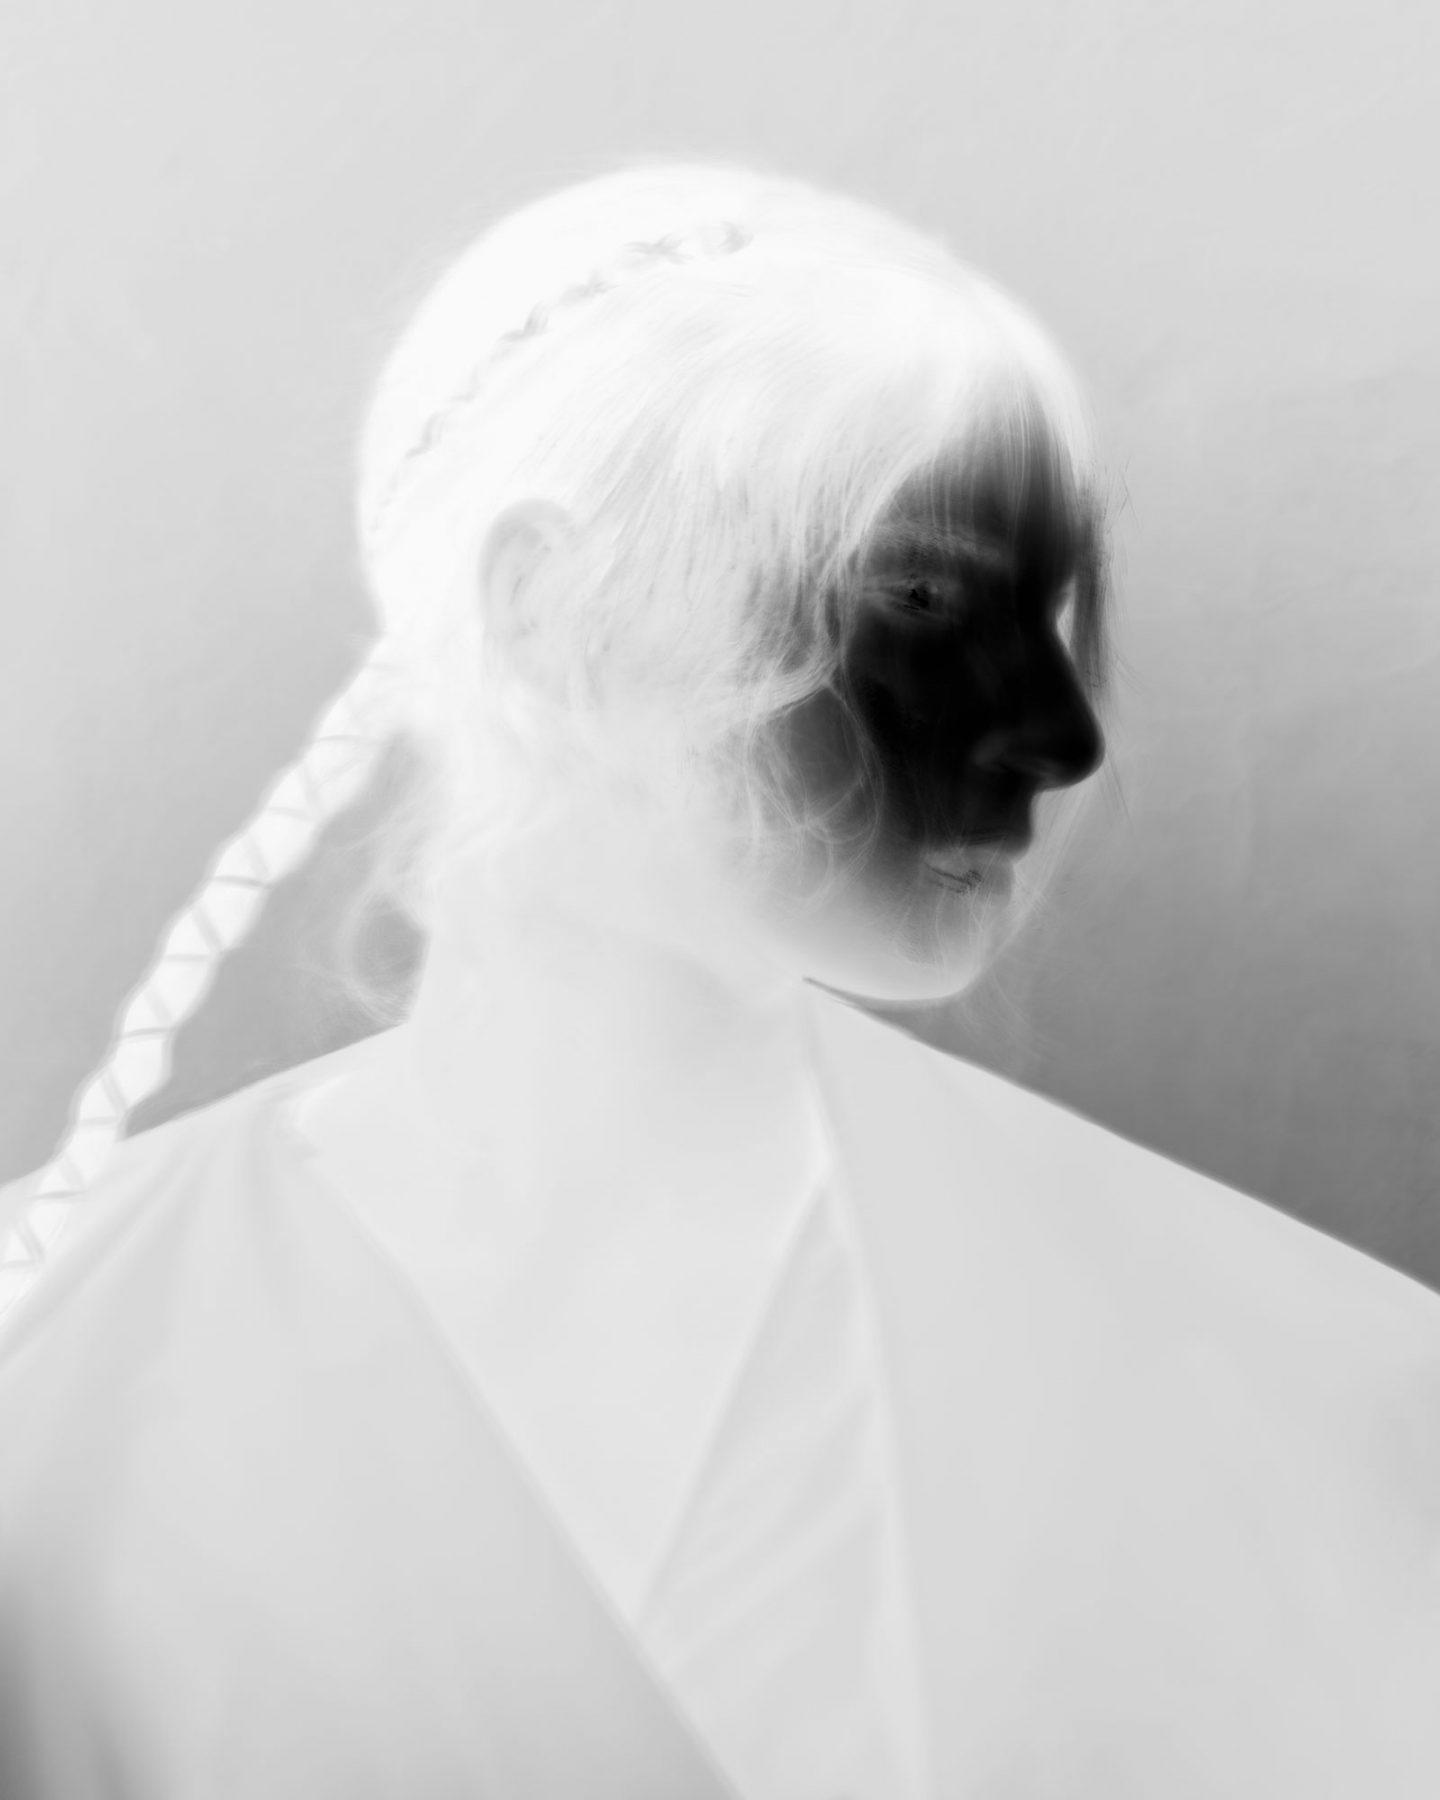 IGNANT-Photography-MarcusSchaefer-08